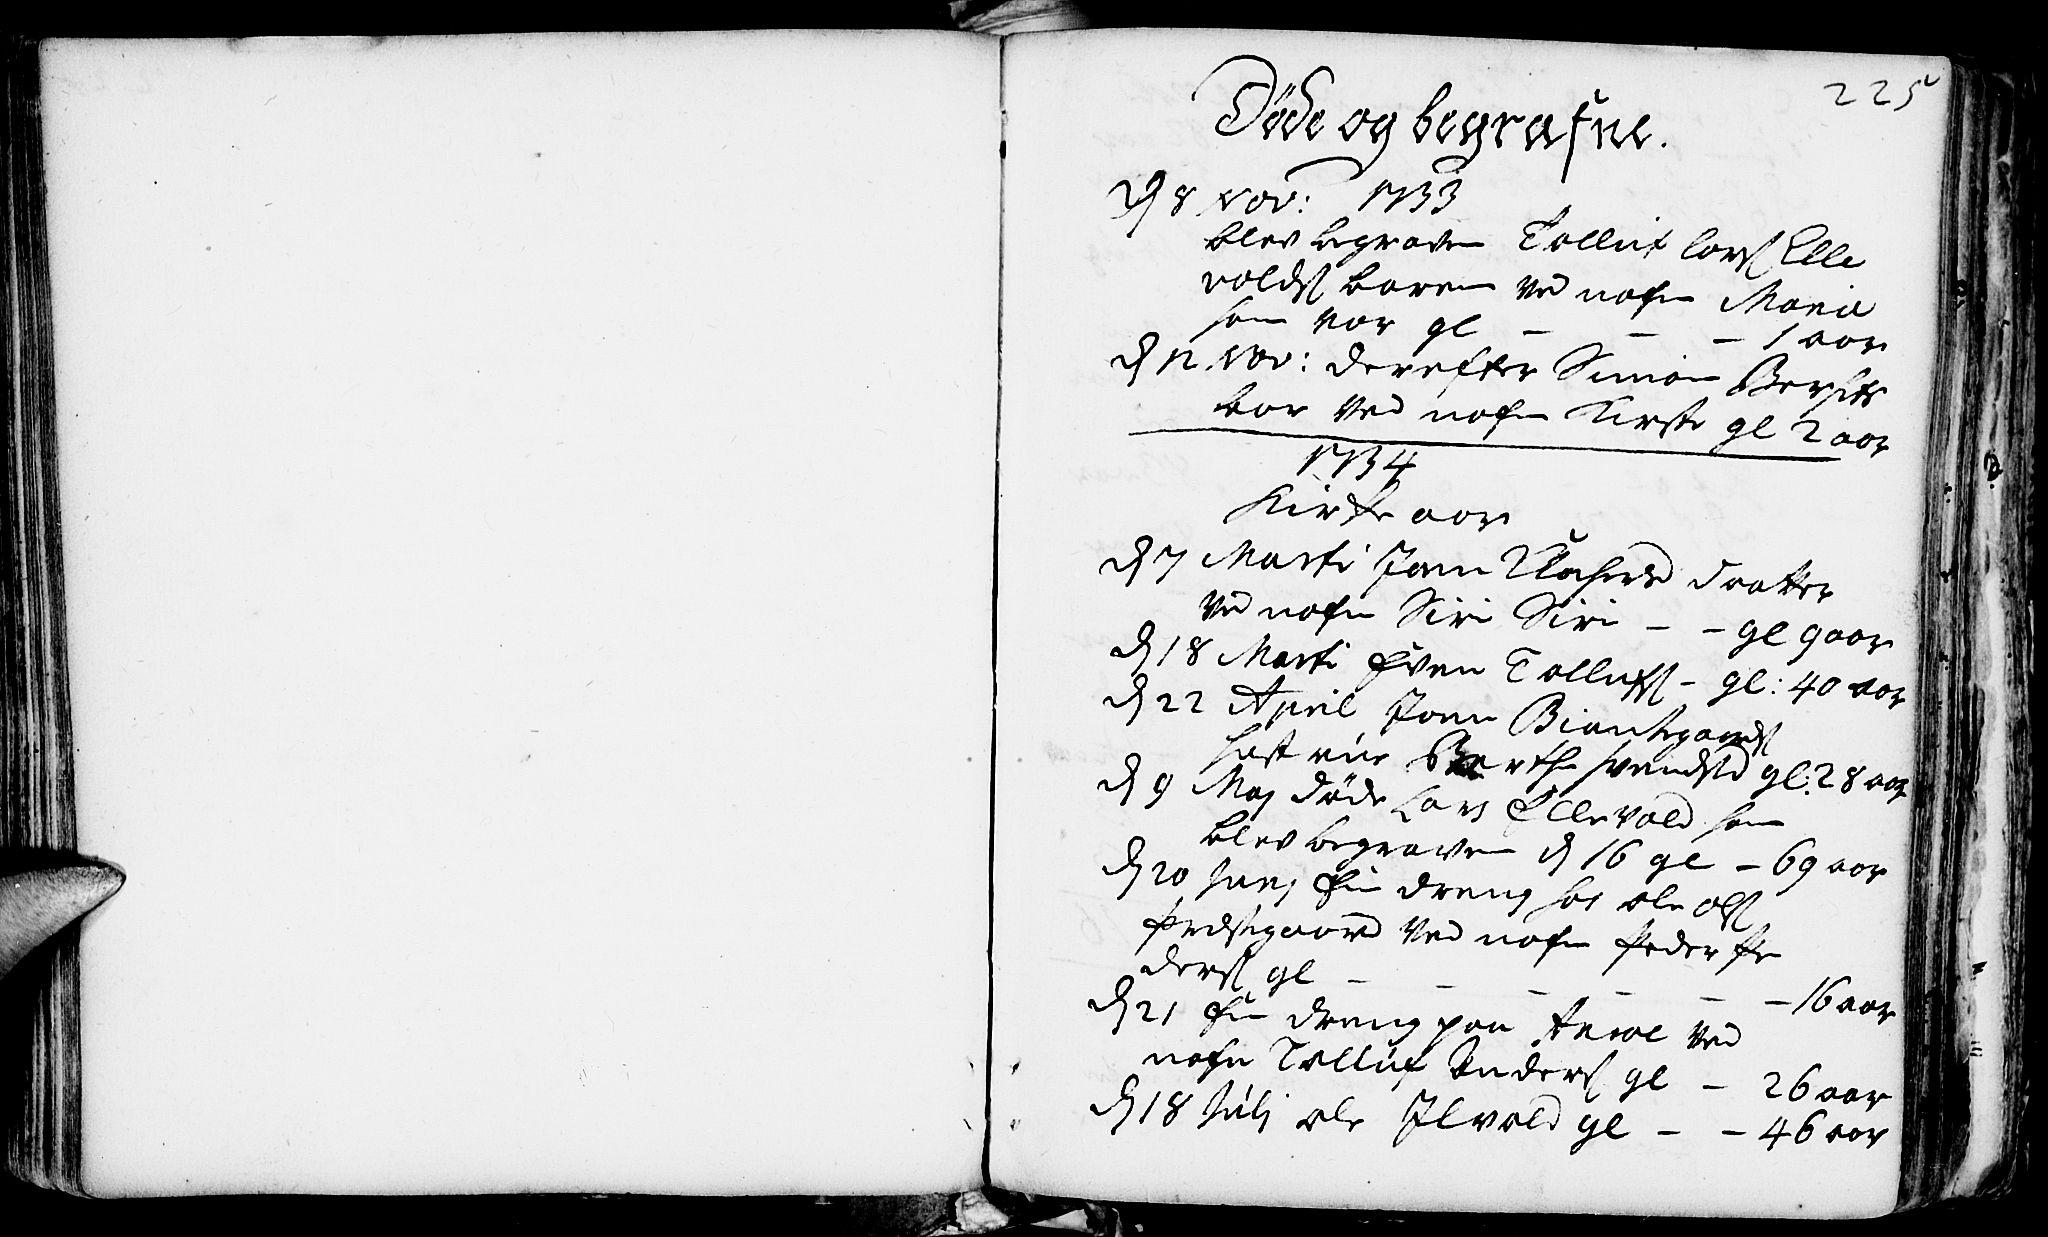 SAH, Rendalen prestekontor, H/Ha/Haa/L0001: Ministerialbok nr. 1, 1733-1787, s. 225